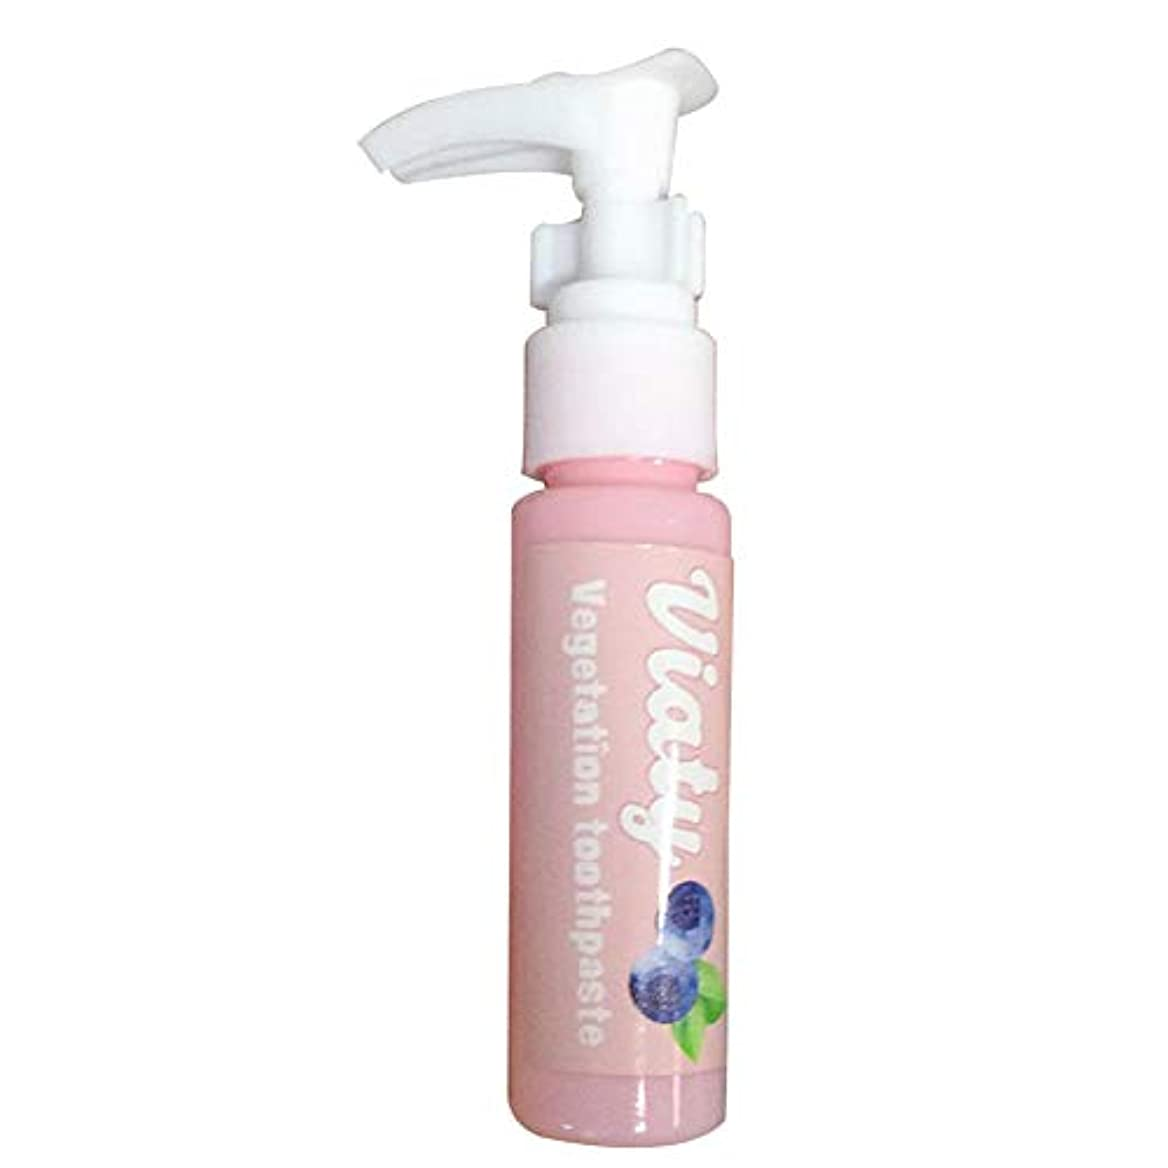 JanusSaja歯磨き粉を押す旅行ベーキングソーダを白くする装置のフルーティーなベーキングソーダ歯磨き粉